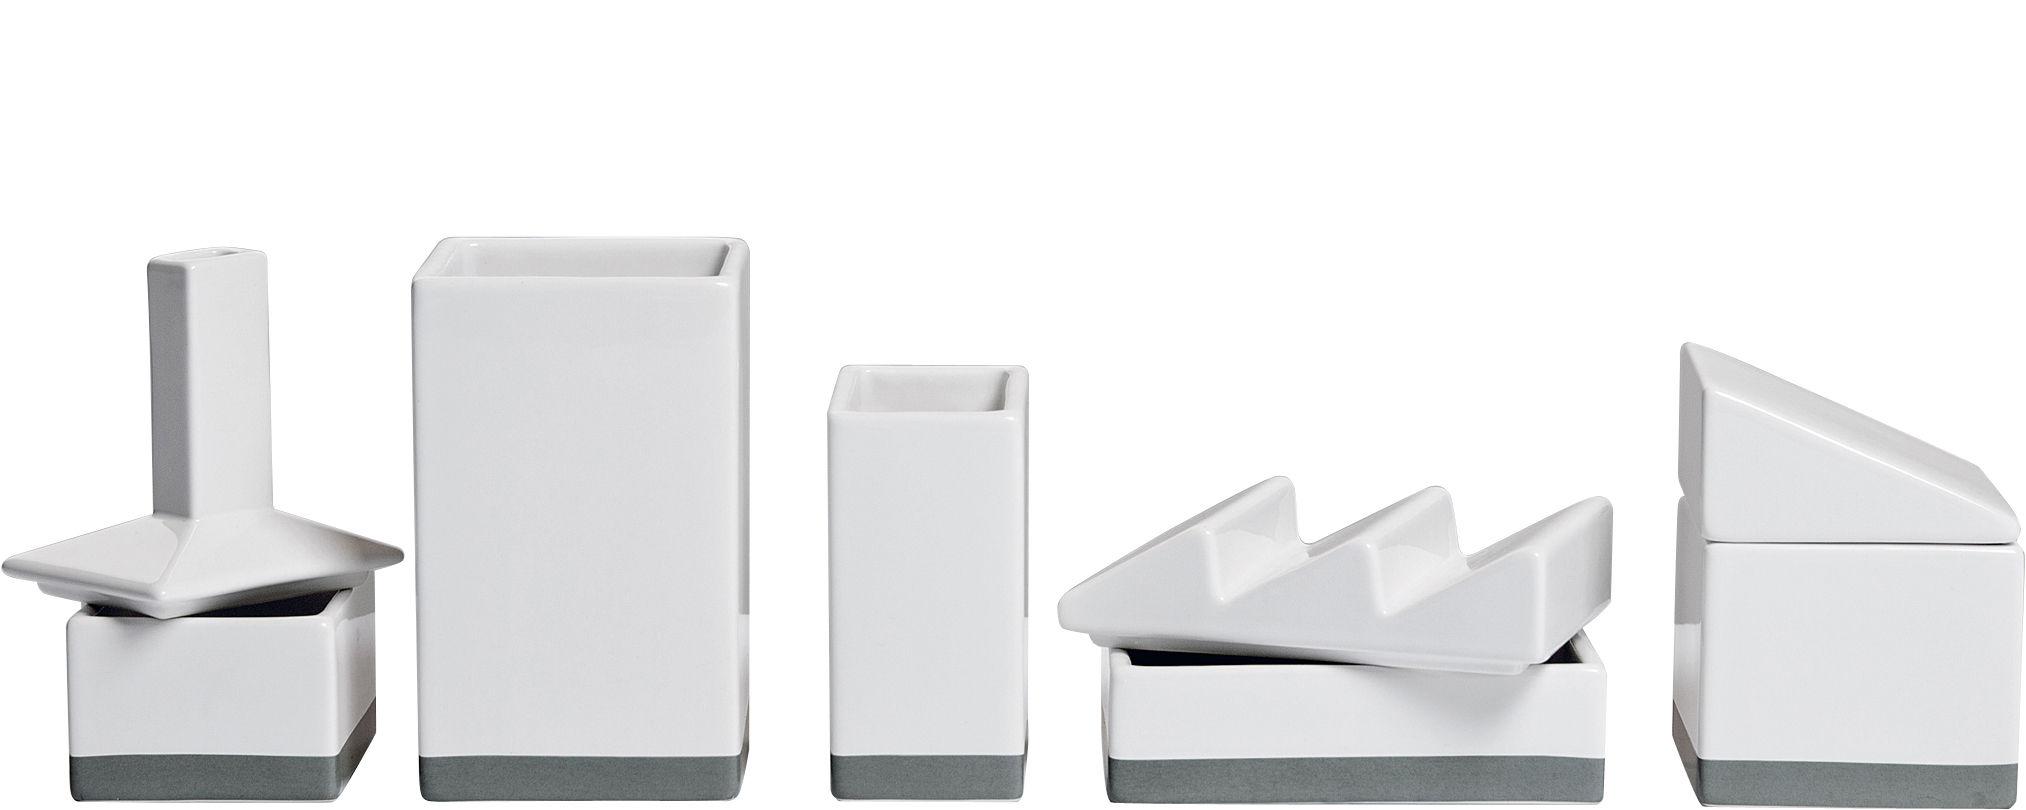 Decoration - Office - L'usine Box - Desk organizers - W 33 cm by Seletti - White - China